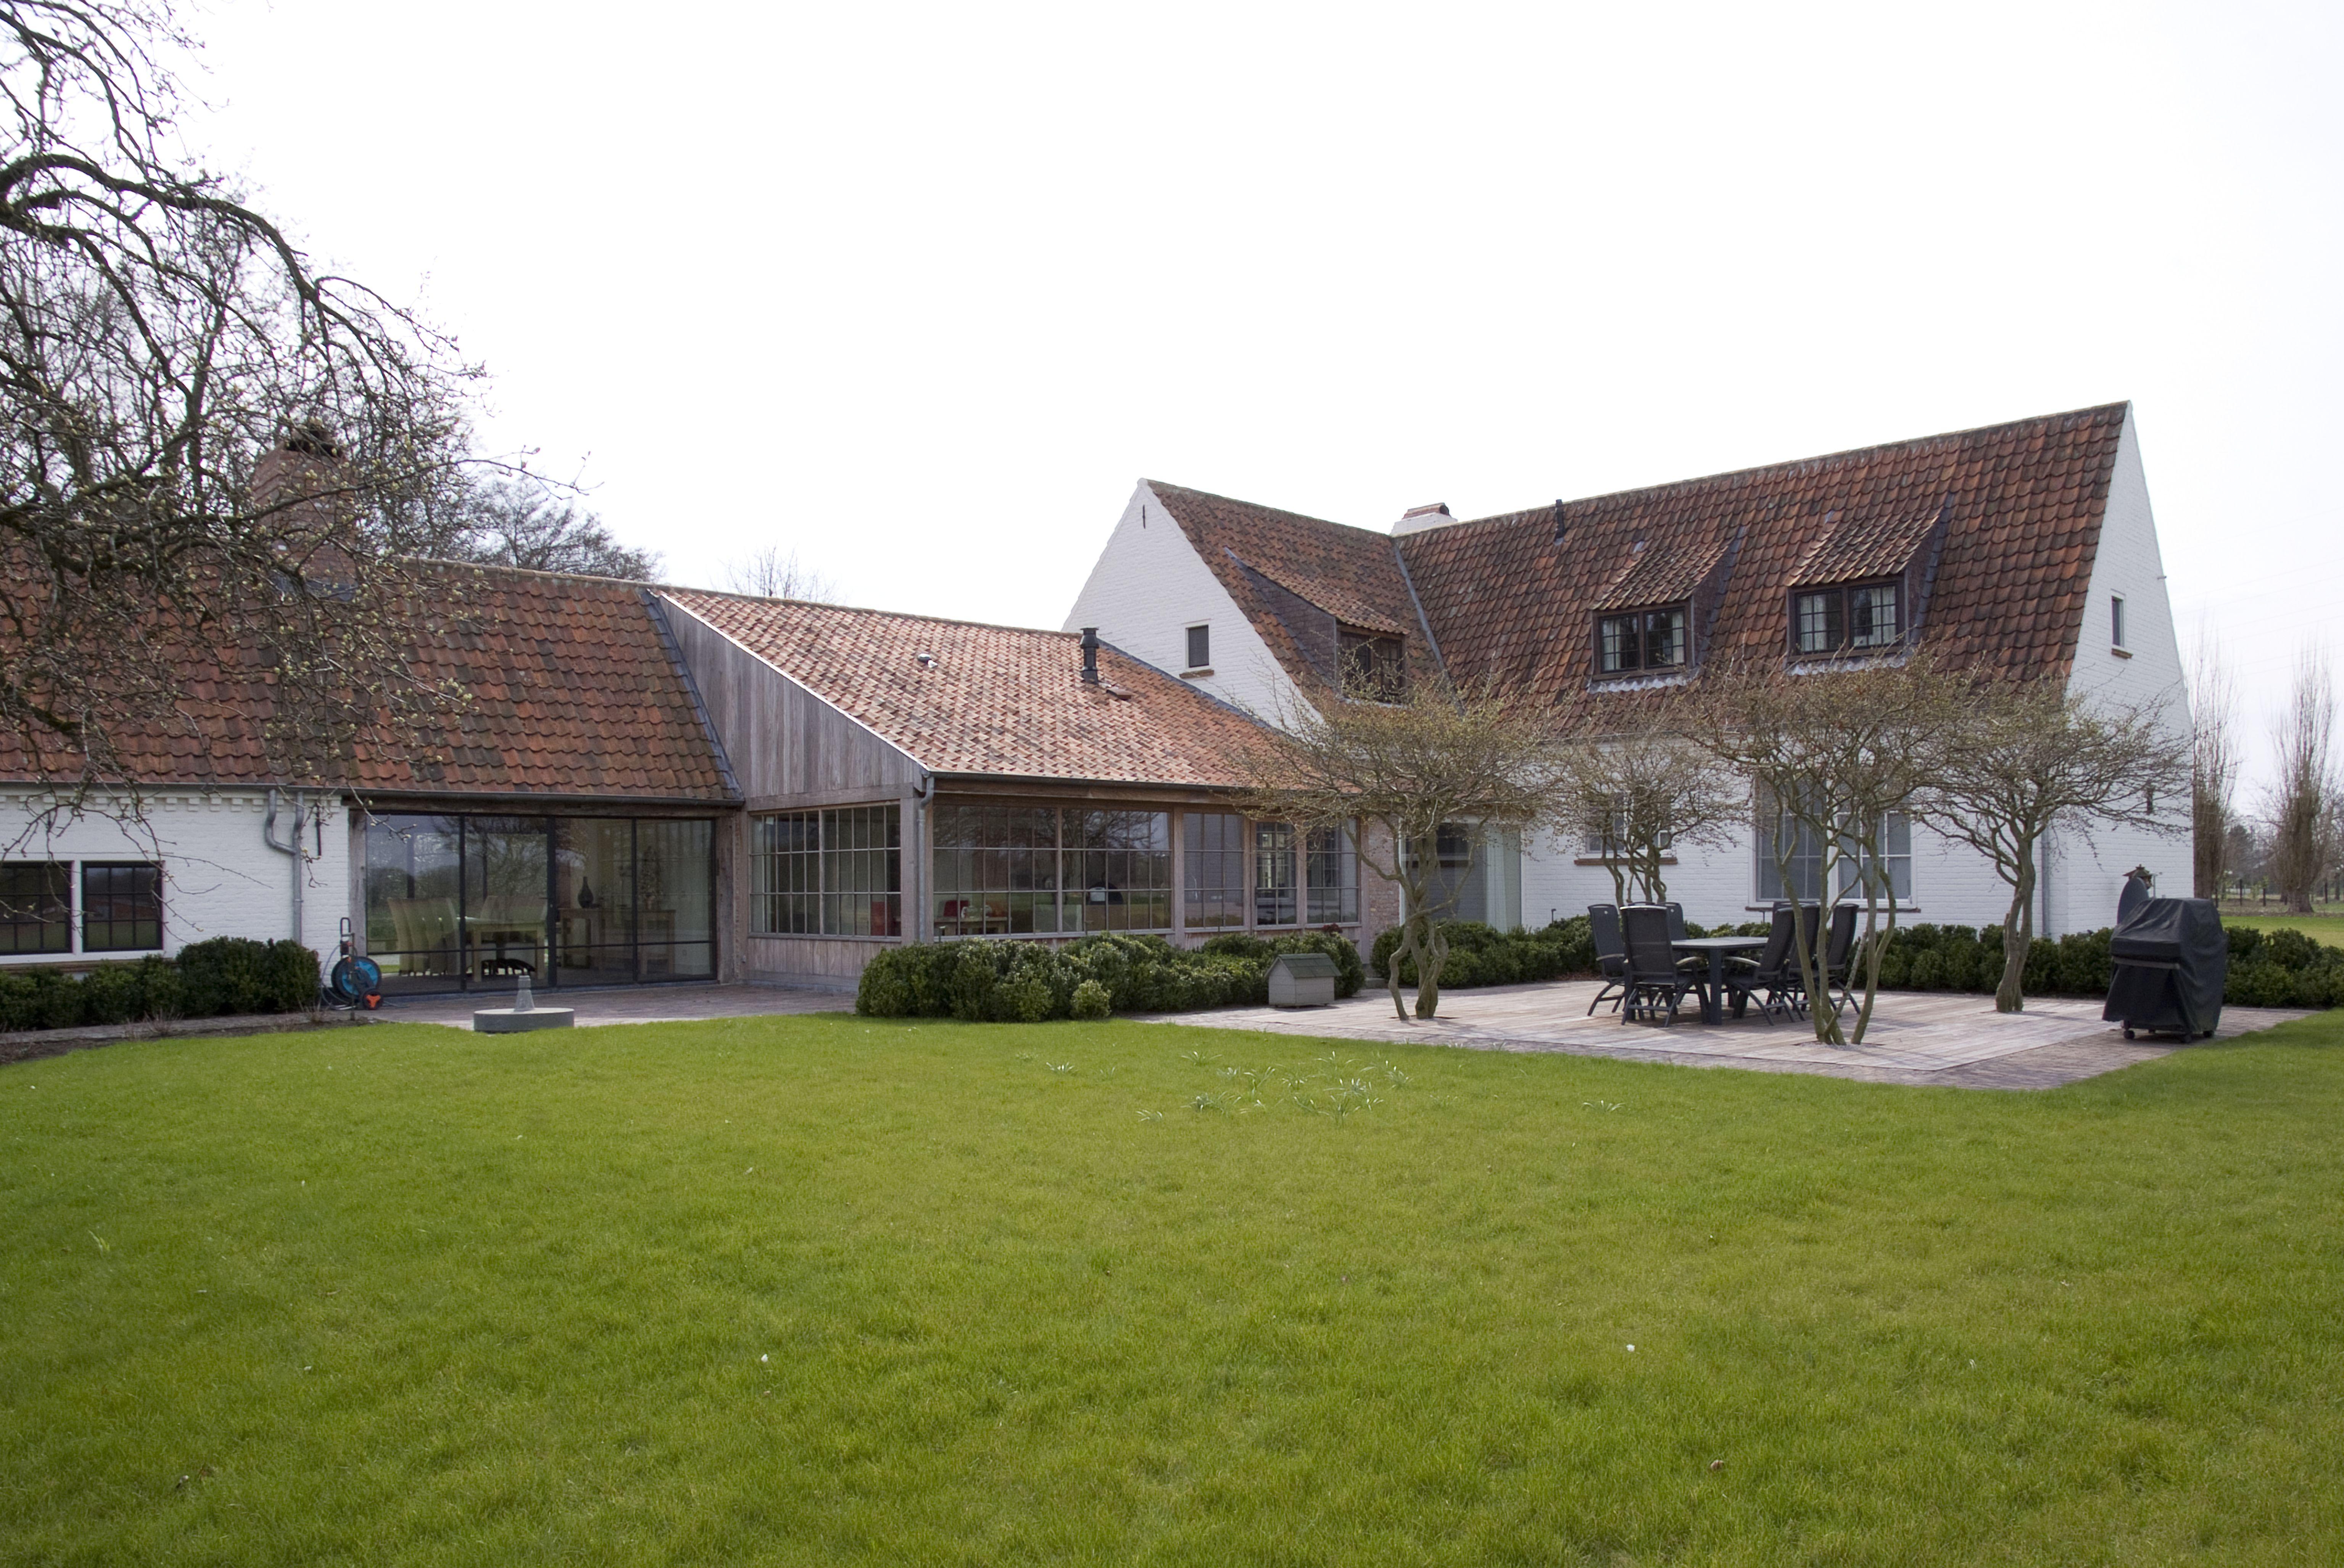 Exclusieve en karaktervolle hoeve landhuis dakkapel